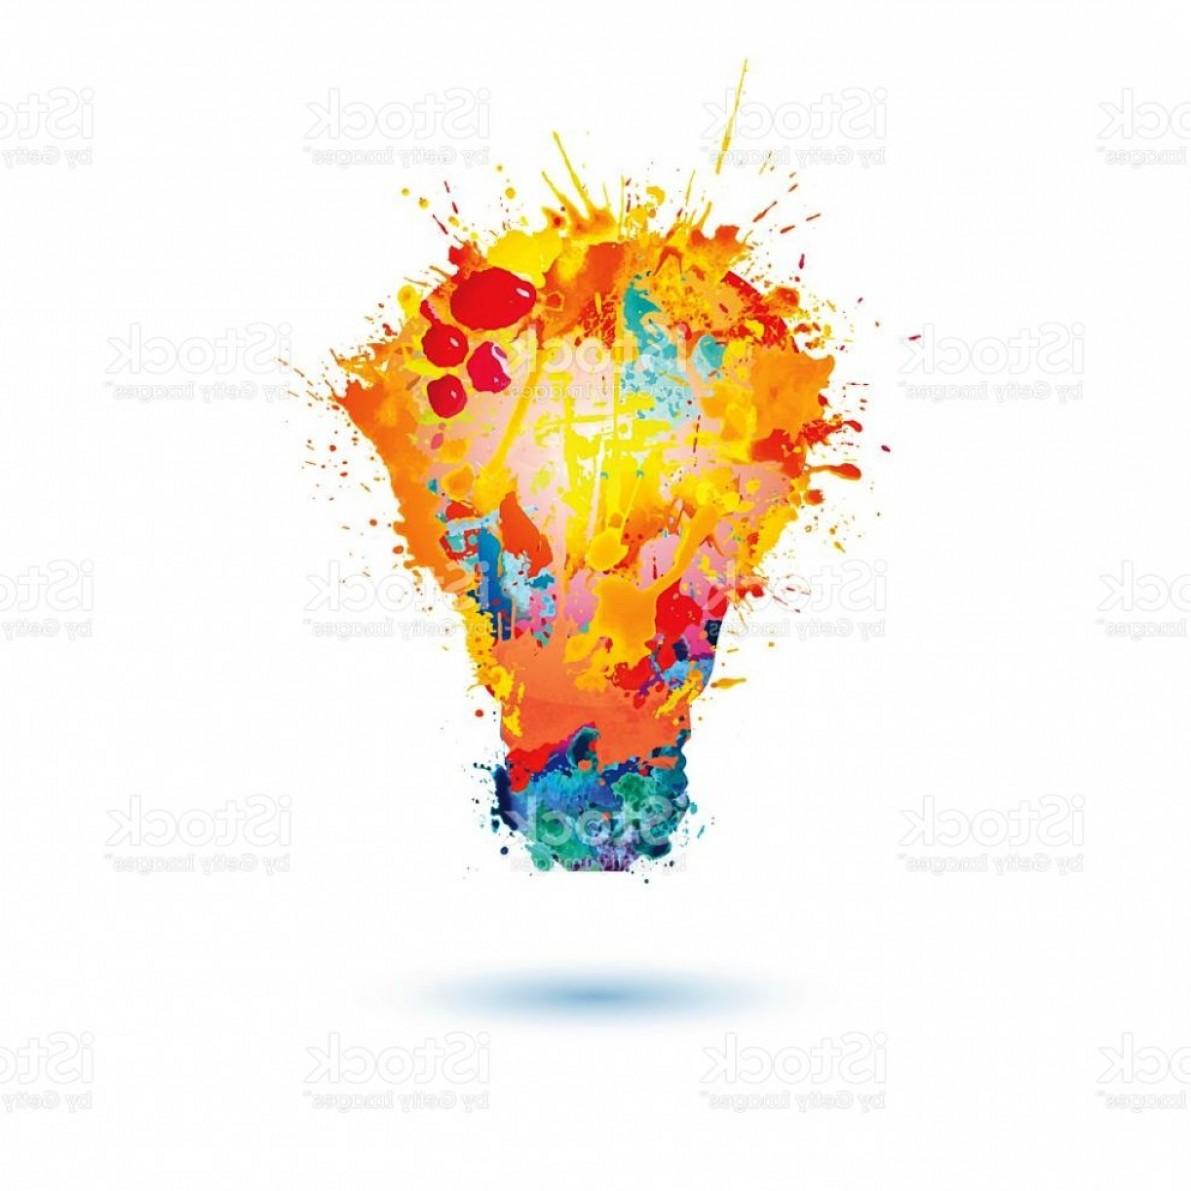 1191x1191 Light Bulb Paint Idea Light Lamp Icon Splash Paint Royalty Free